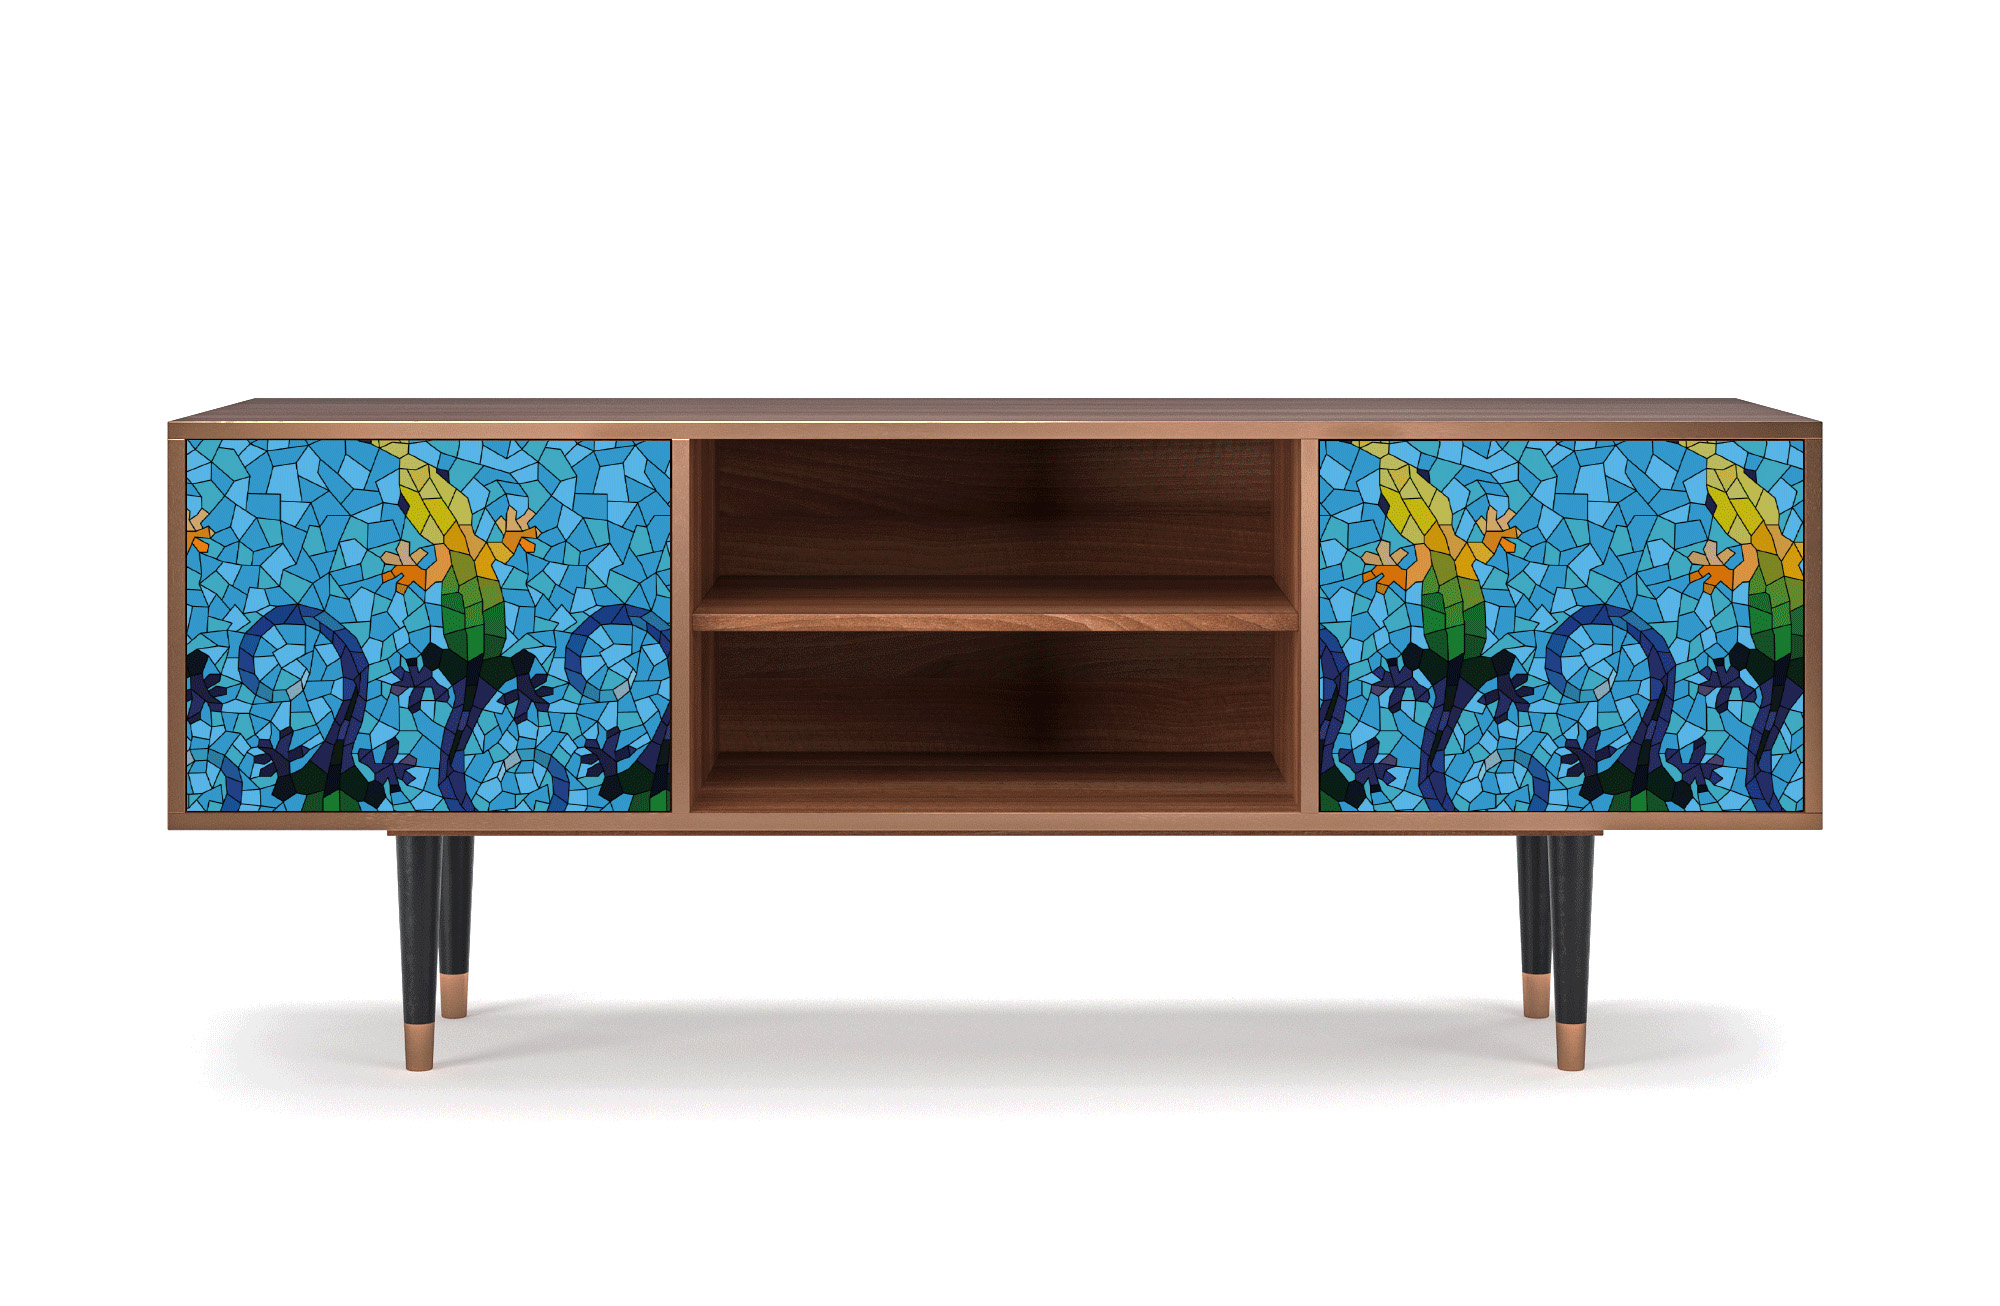 maison du monde Meuble TV bleu 170cm 2 portes